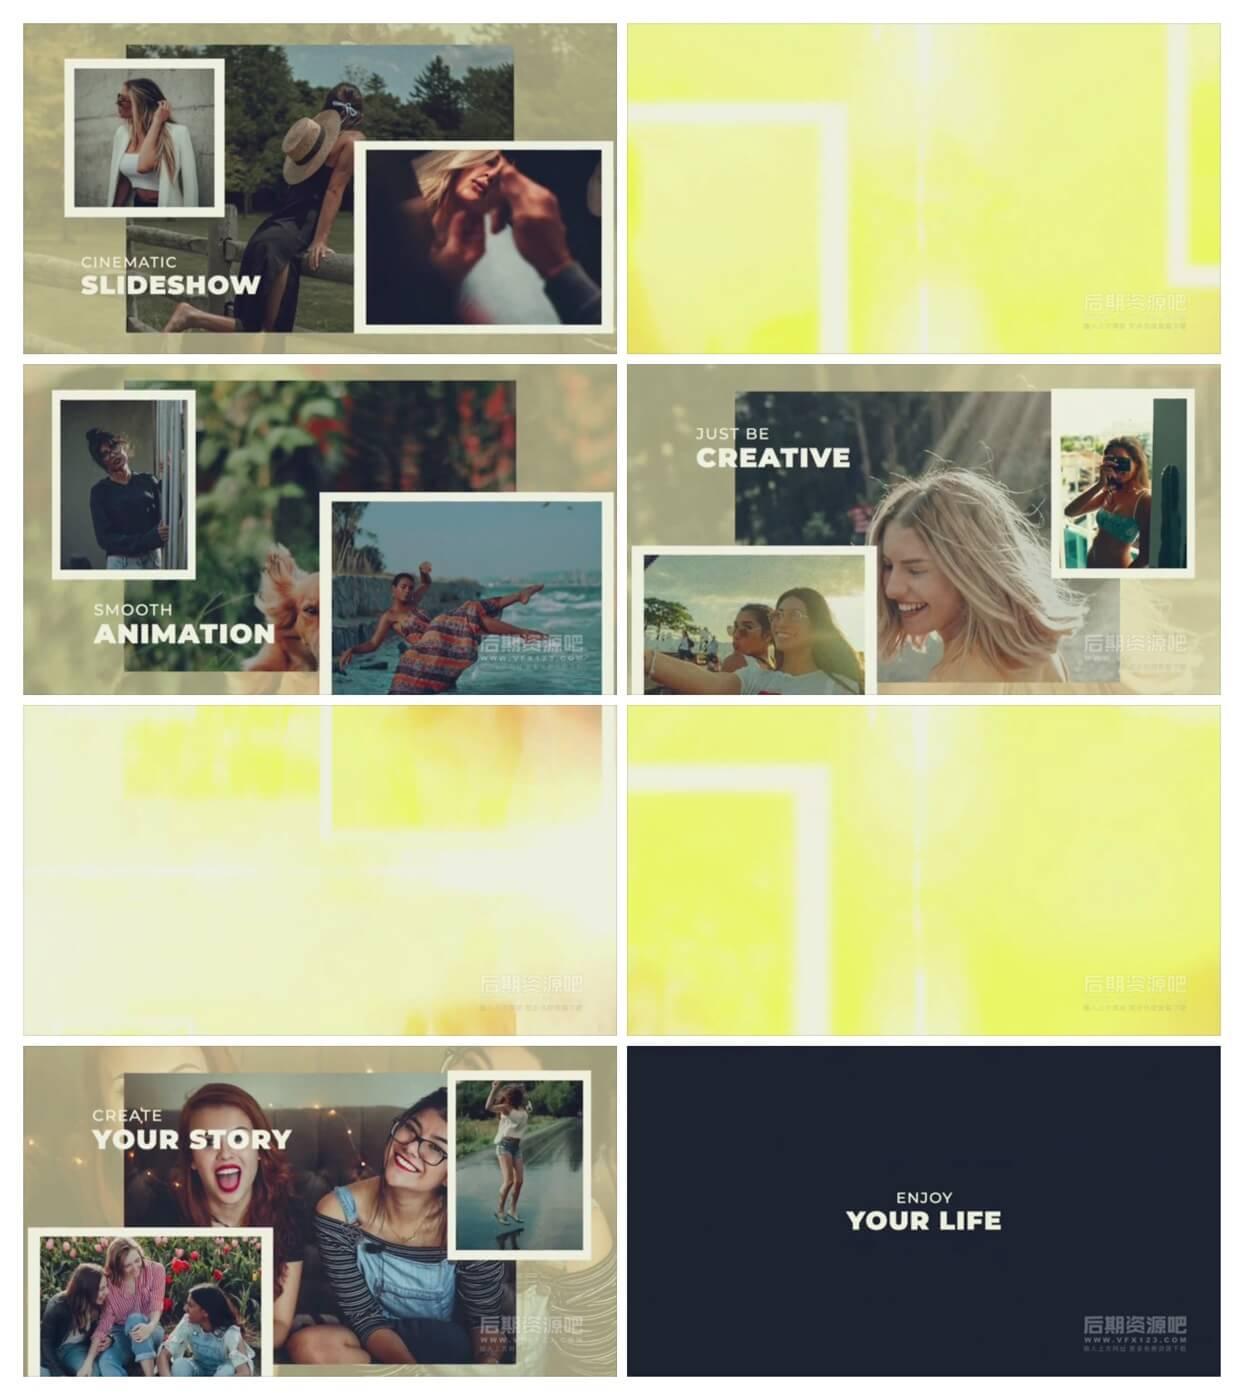 fcpx主题模板 美好回忆纪念相册图文展示 Memories Slideshow